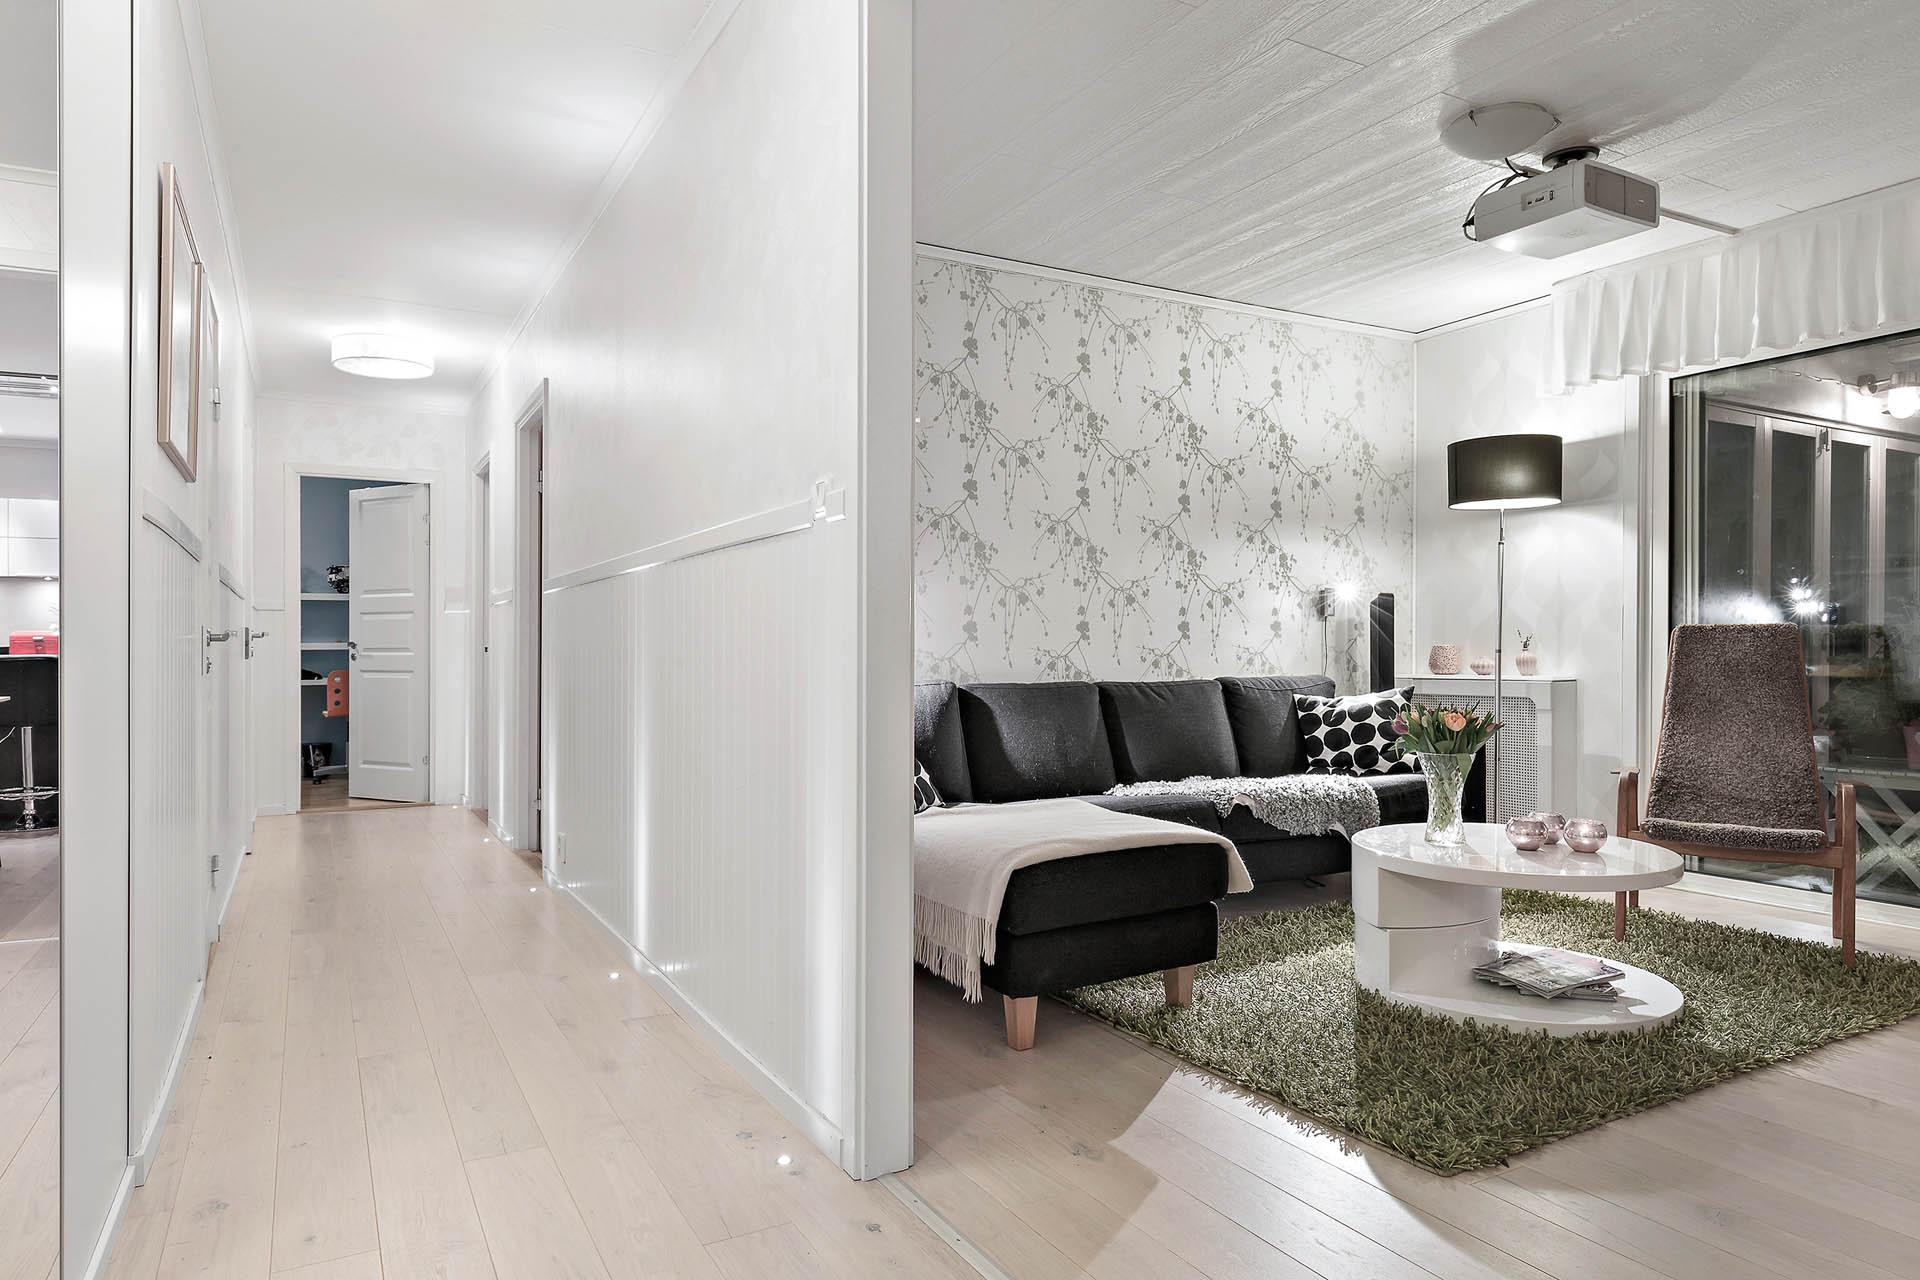 Hall med belysning i golvet